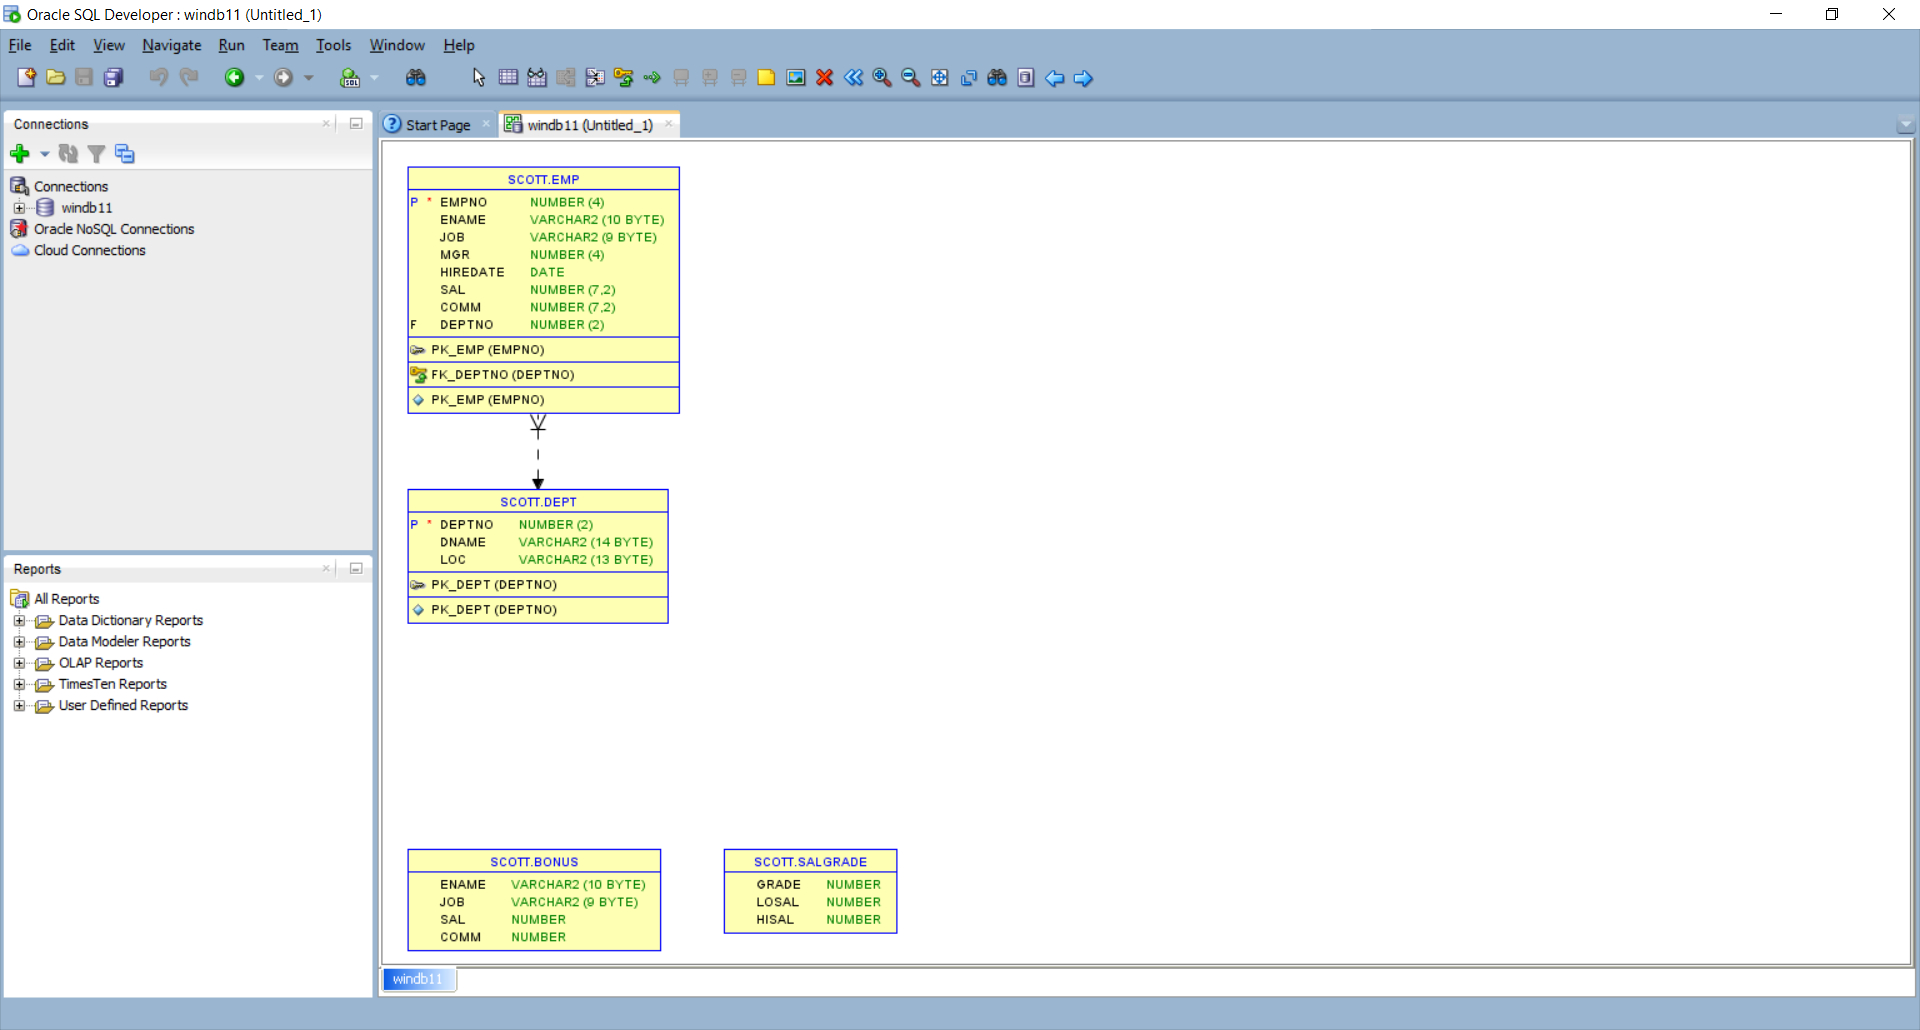 Database Diagram Using Sql Developer - Blog Dbi Services intended for Er Diagram Using Sql Developer